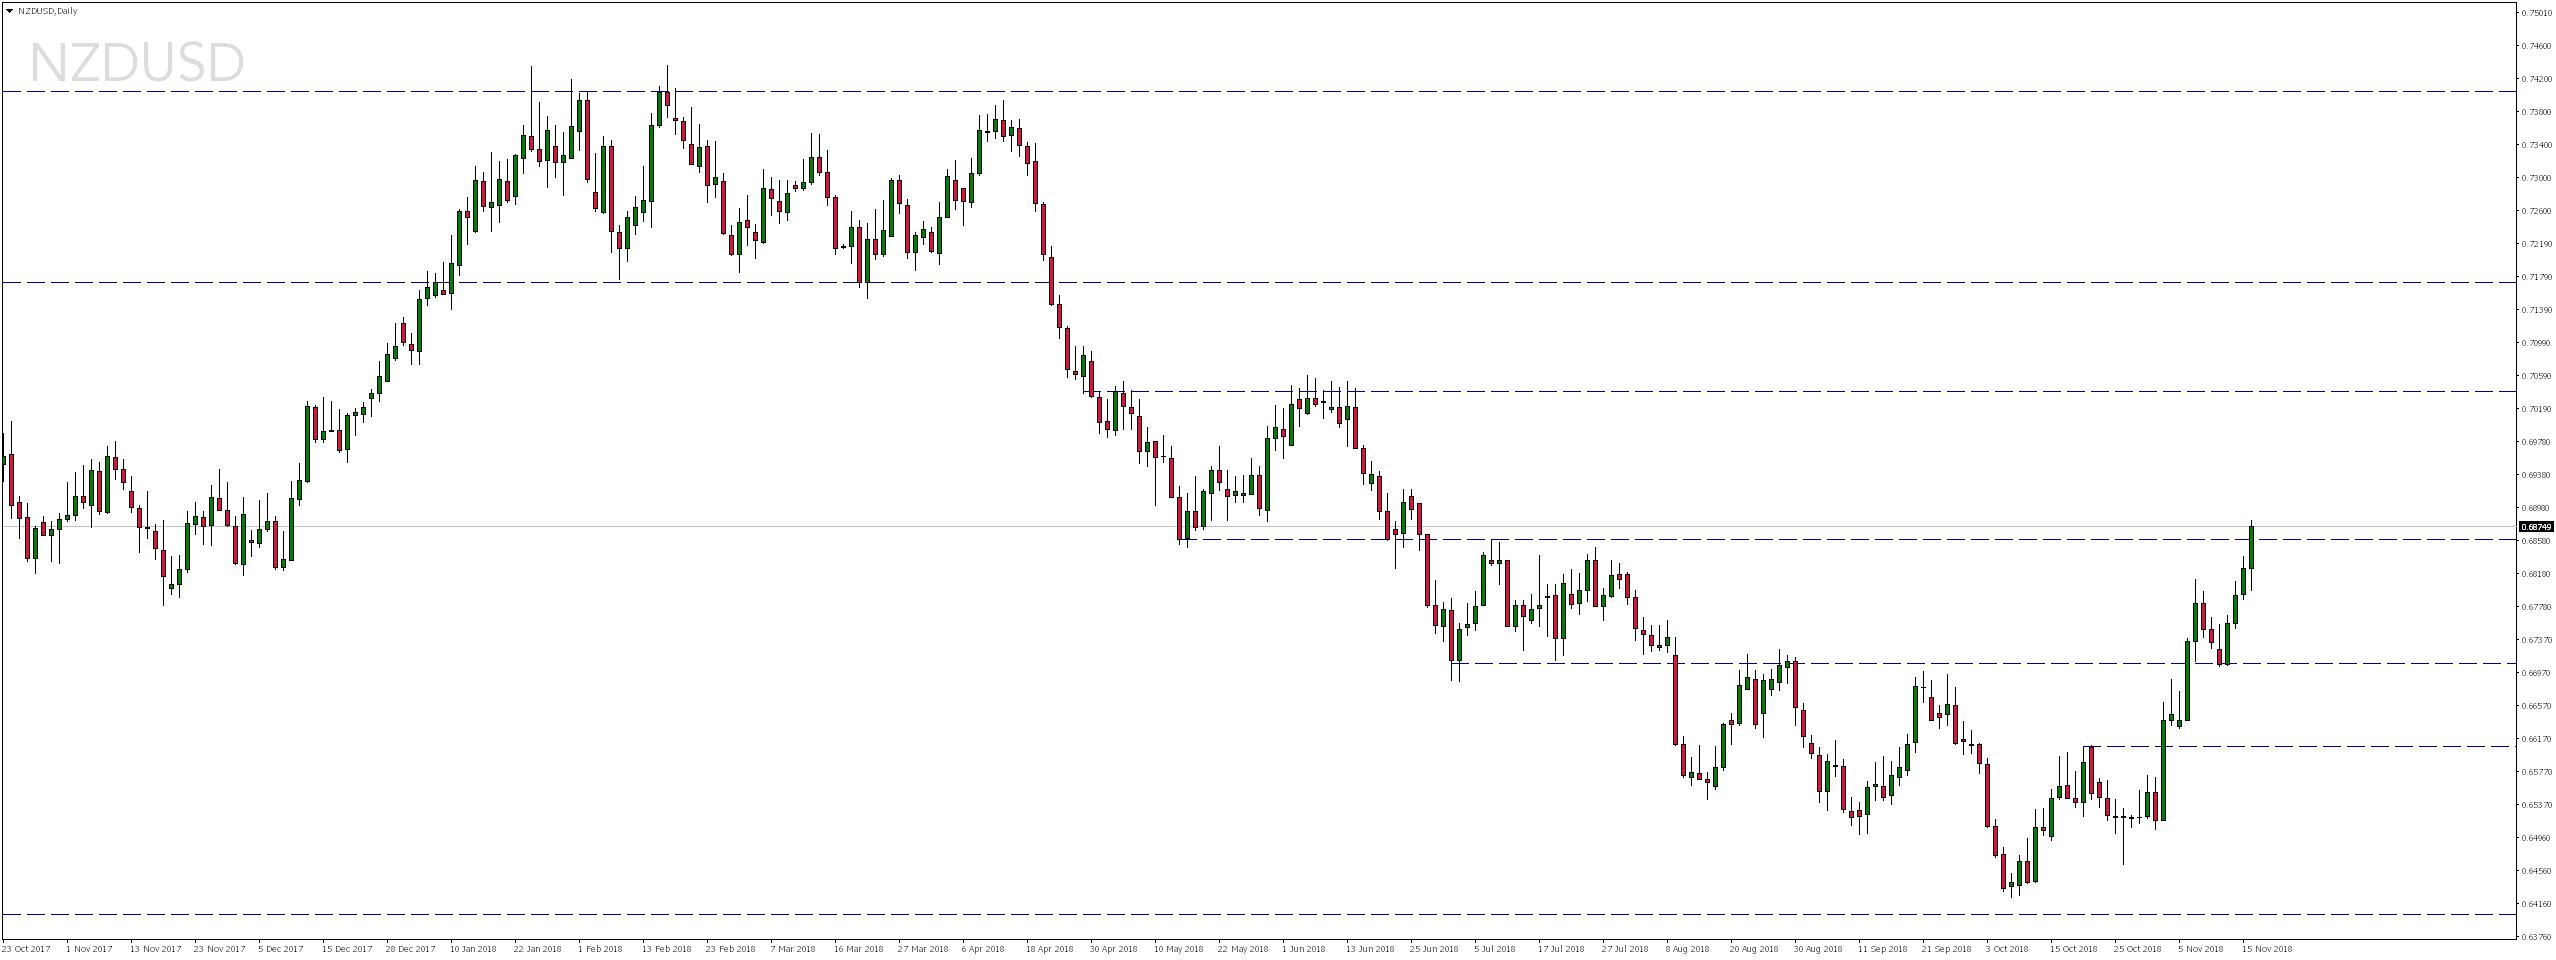 Notowania pary walutowej NZDUSD